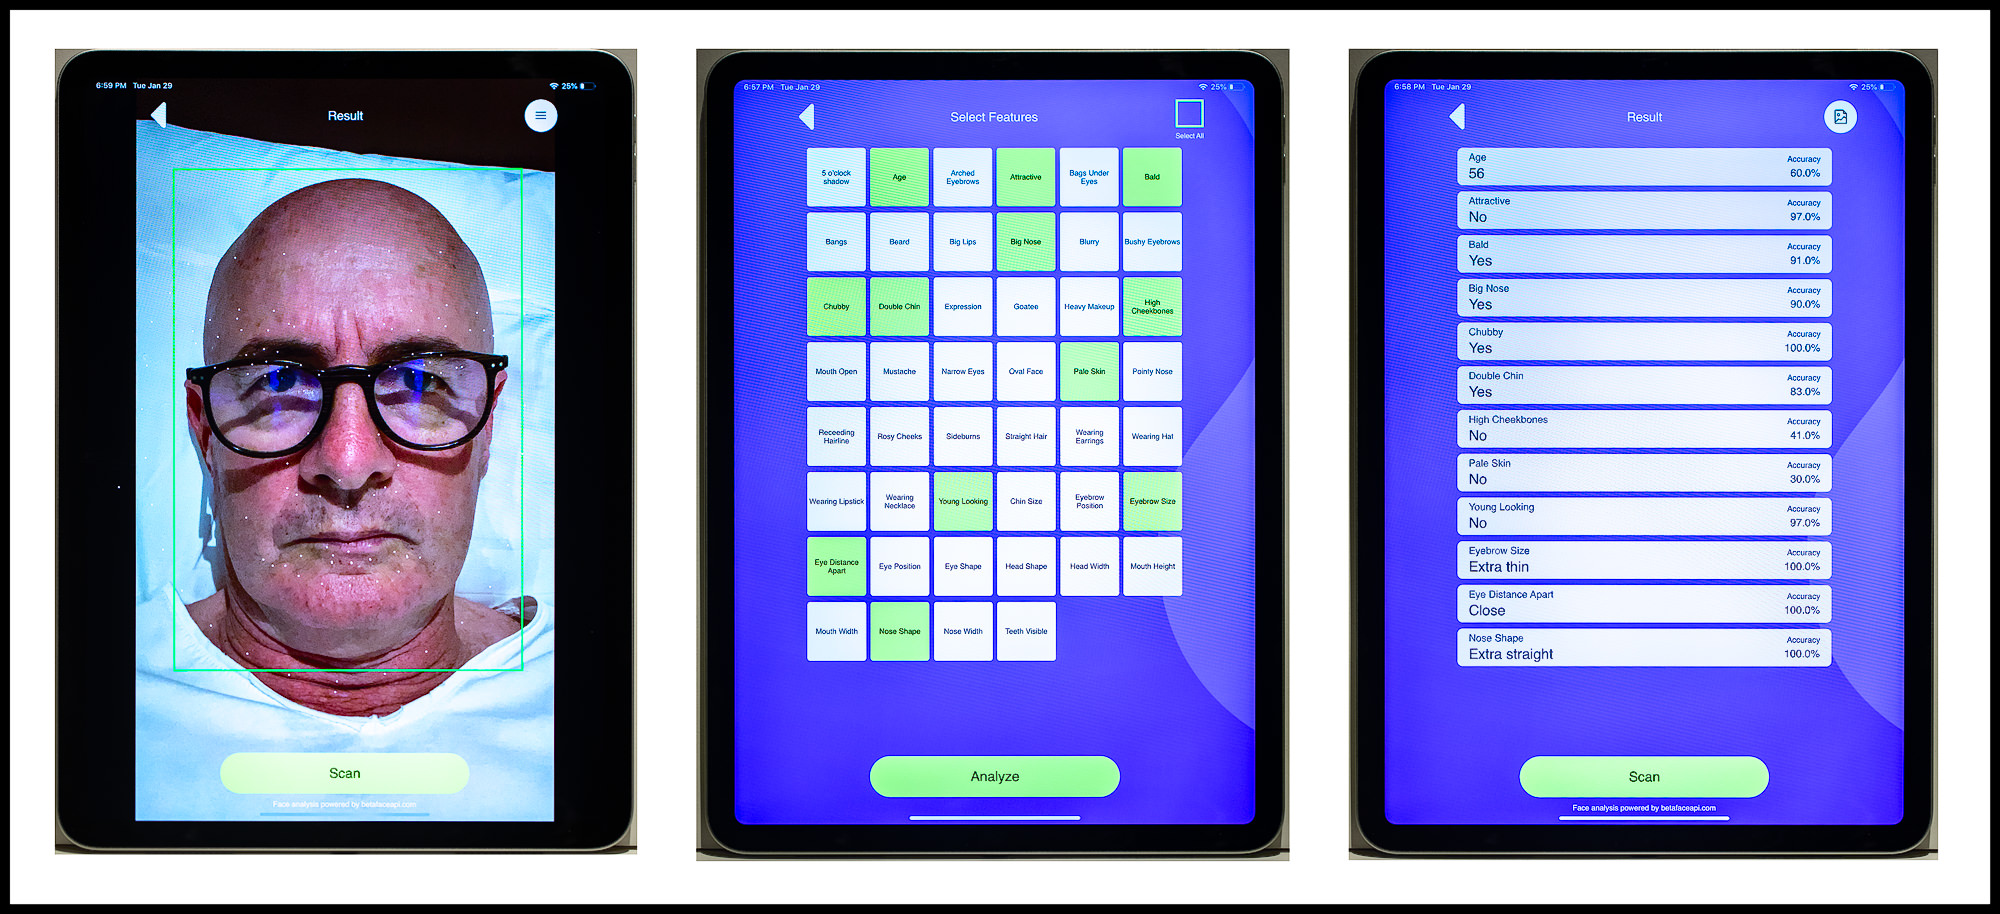 iPad Application BetaFace